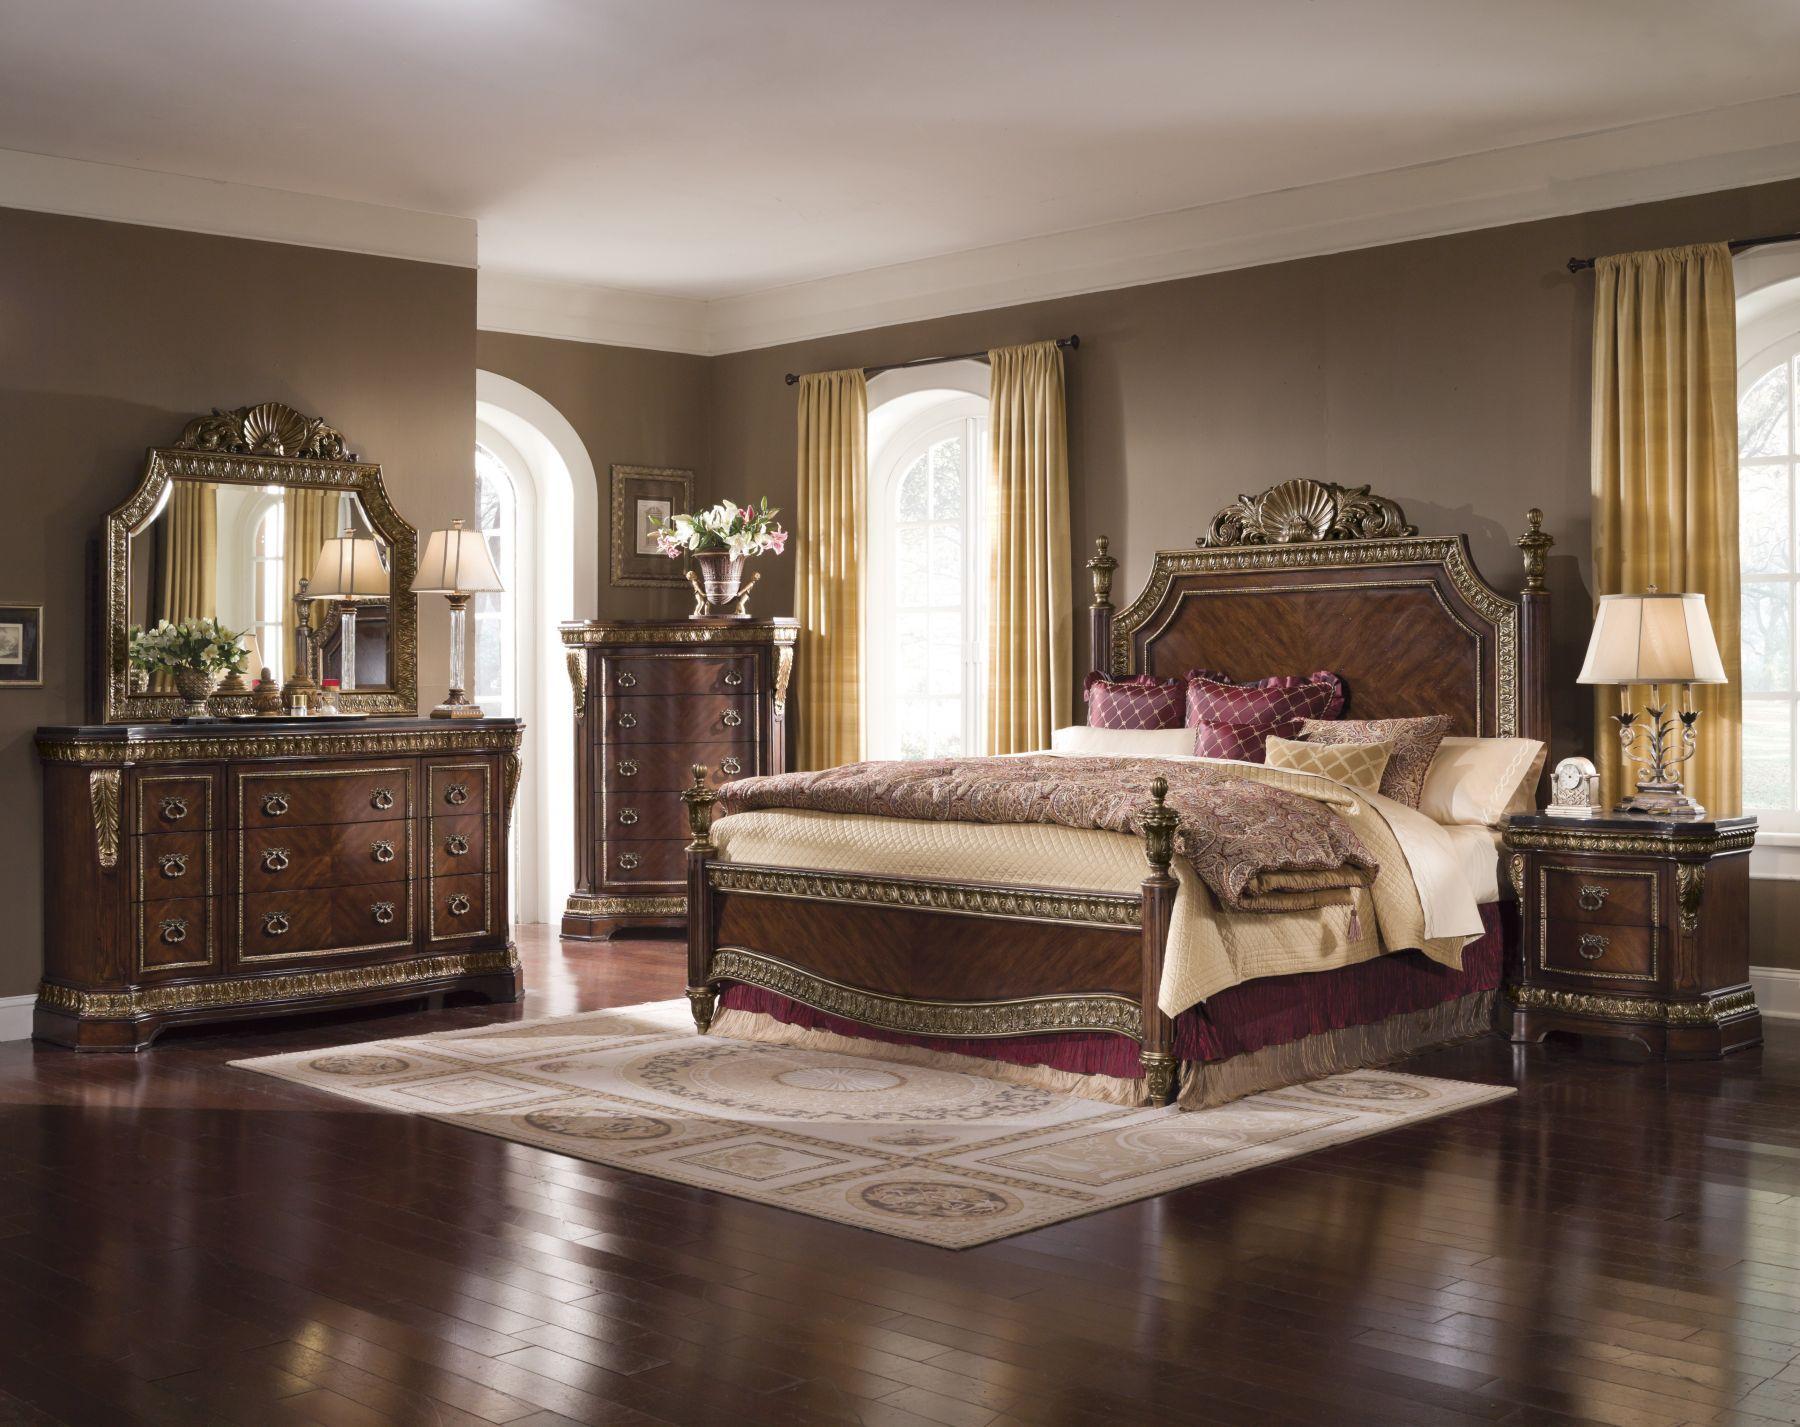 King Bed Decor – King Bedroom Ideas